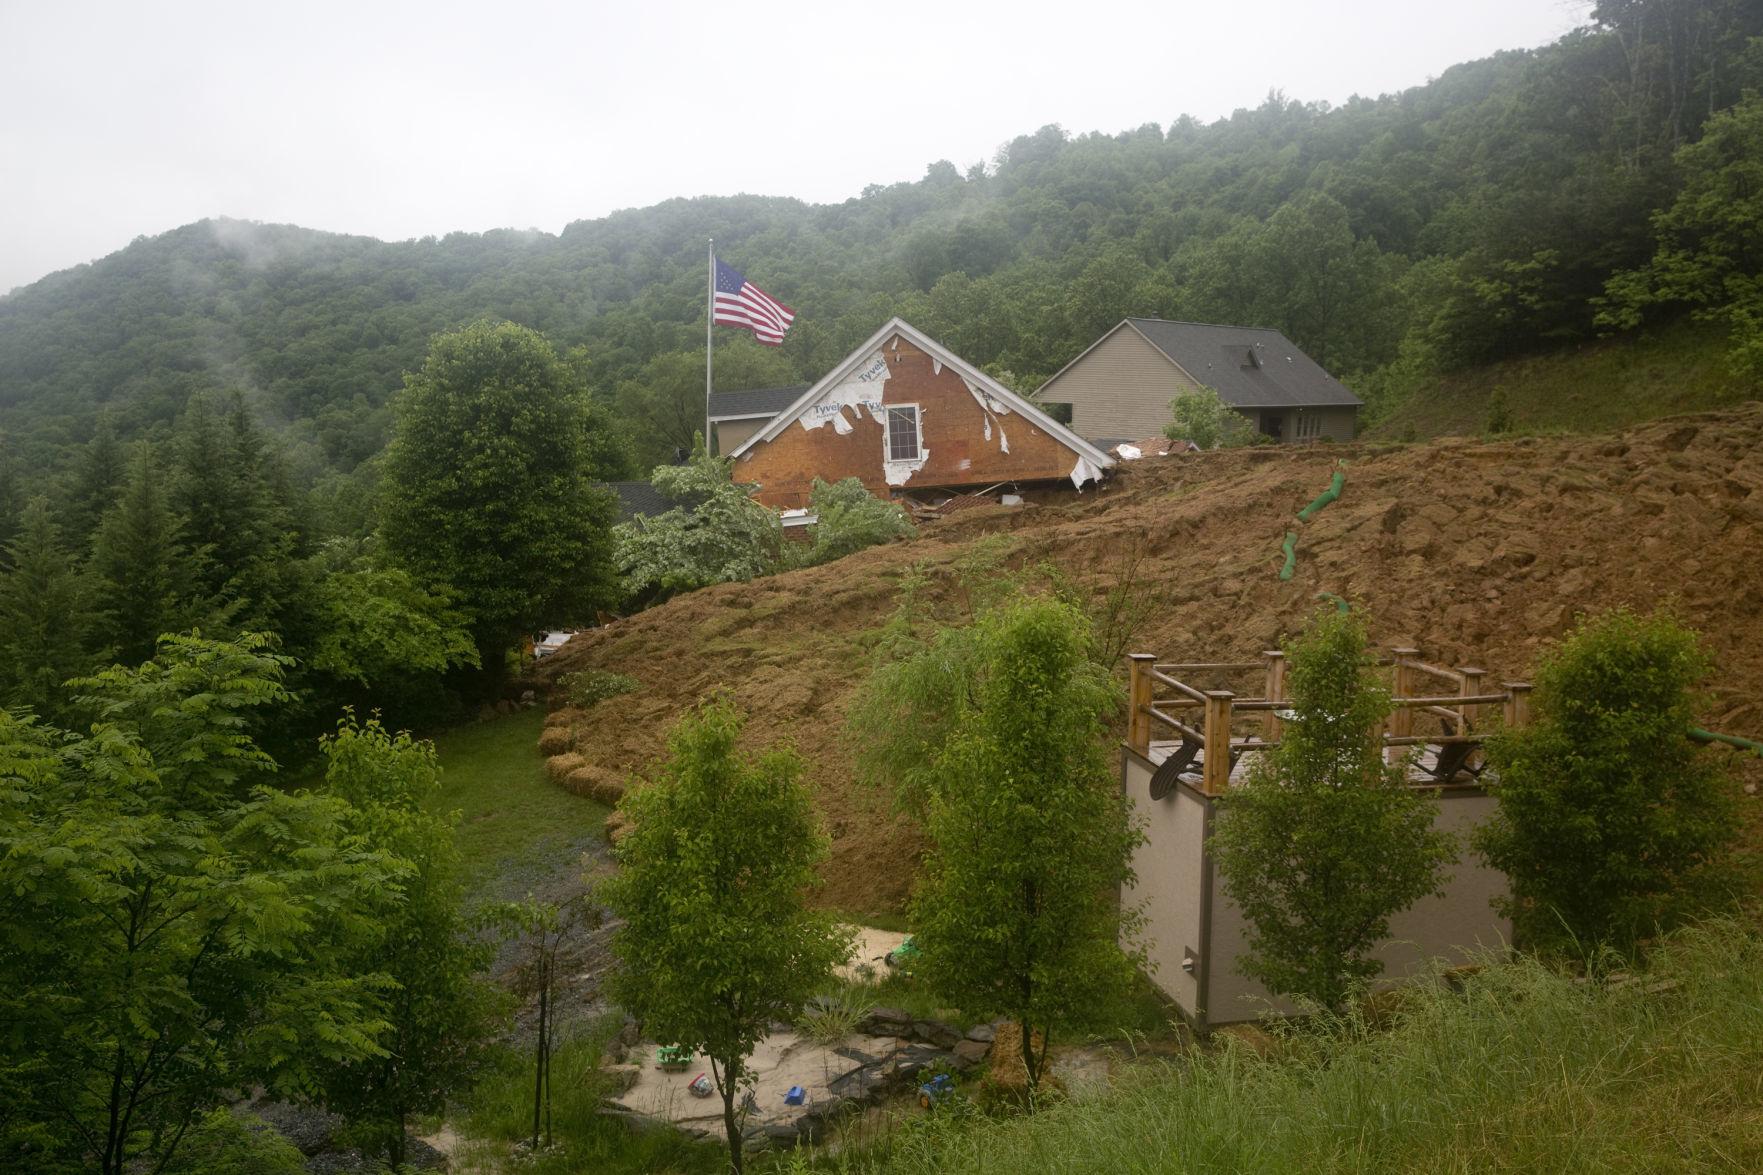 skd toddburyhouseslide 051818 p01 Mudslide destroys home